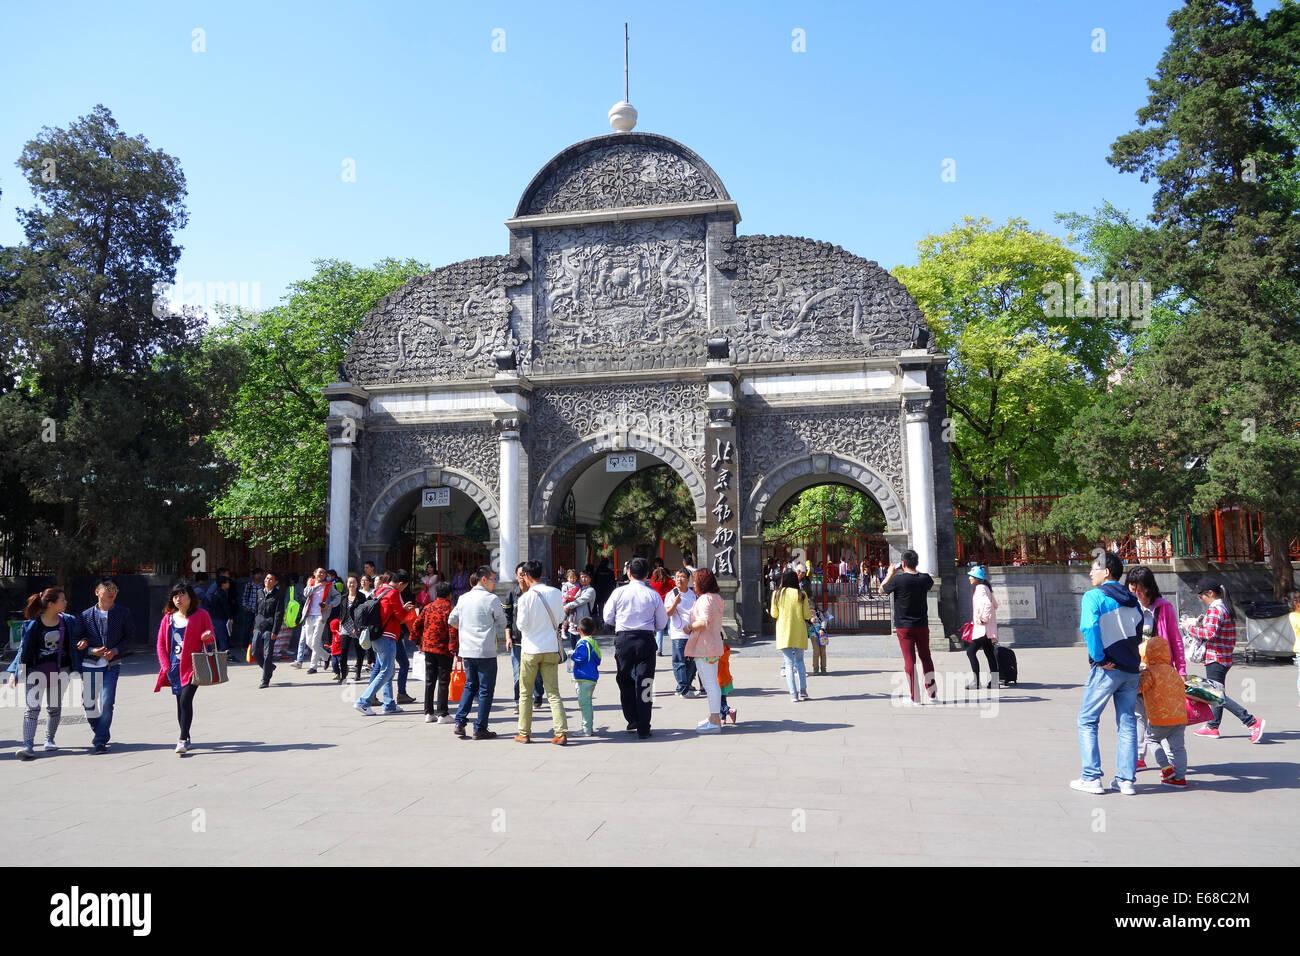 La entrada del Zoo de Beijing, Xicheng District, China Imagen De Stock